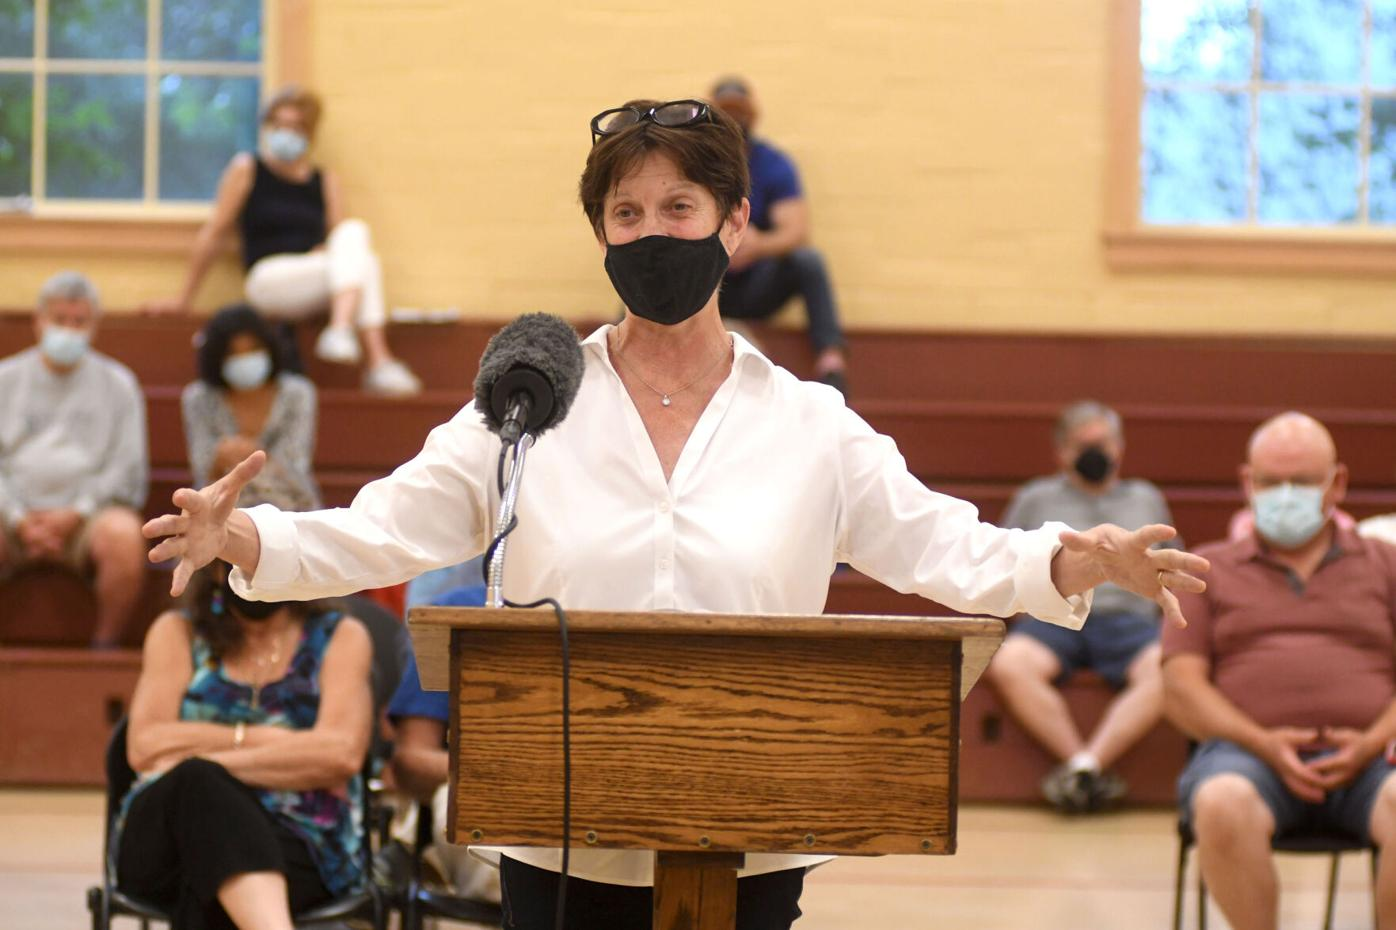 Amy Brentano speaks at the podium (copy)